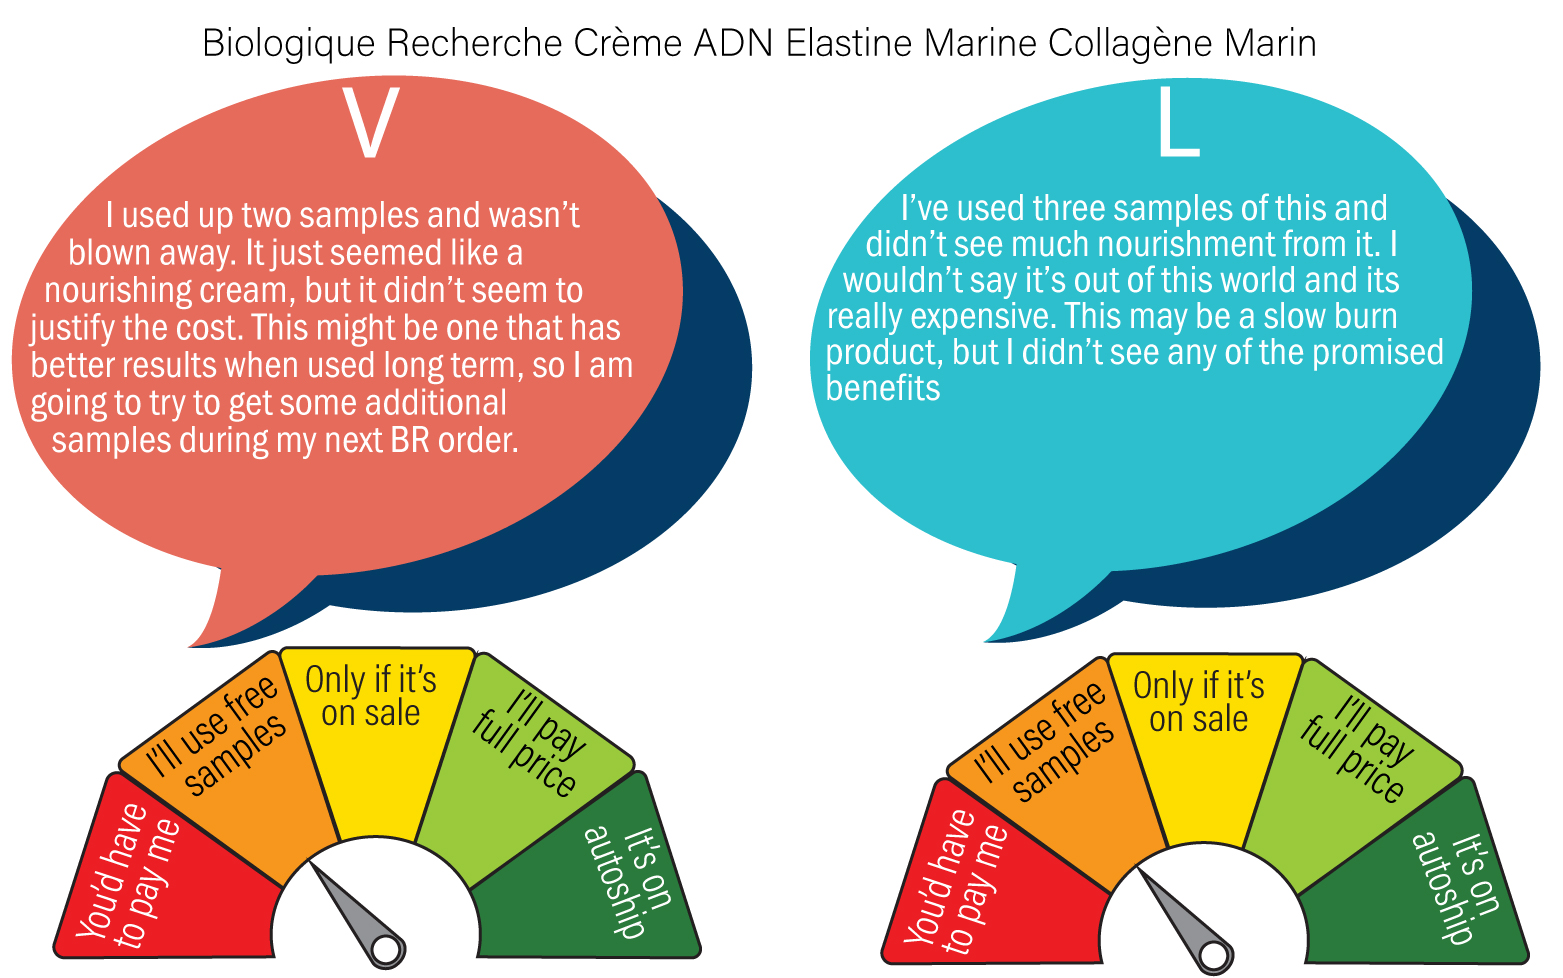 Creme-ADN-Elastine-Marine-Rveiew